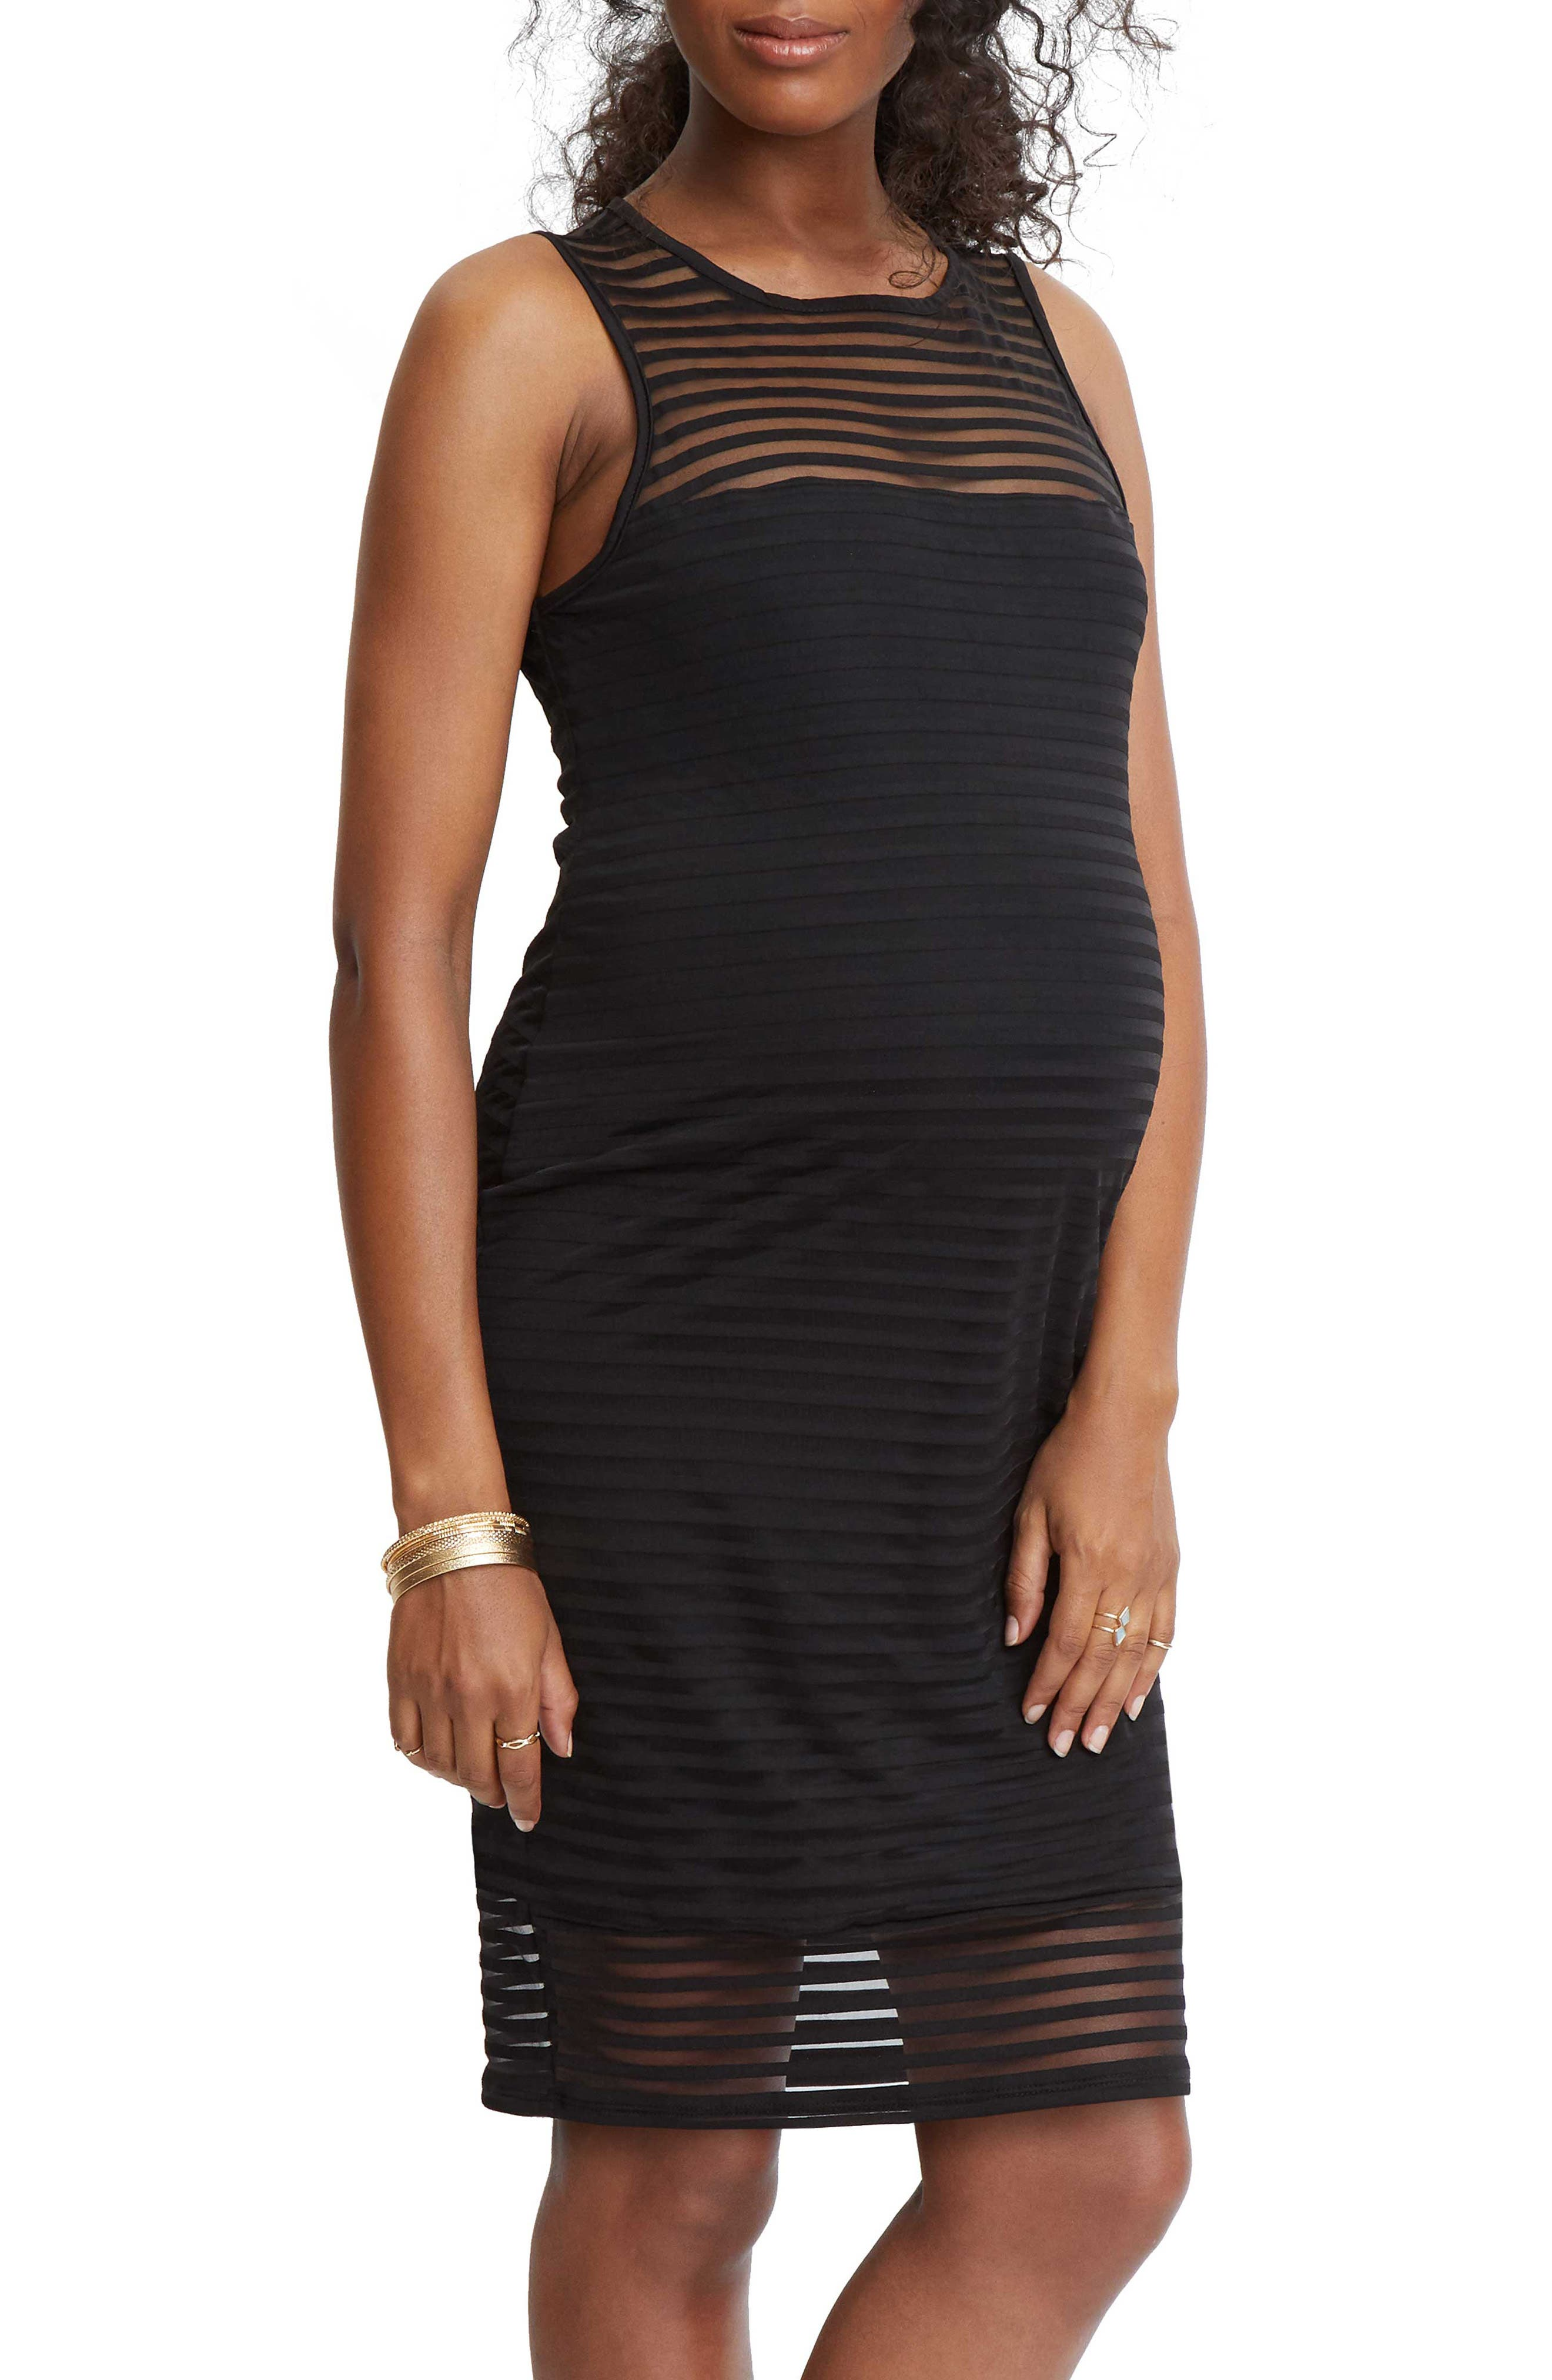 STOWAWAY COLLECTION,                             Shadow Stripe Maternity Sheath Dress,                             Main thumbnail 1, color,                             BLACK